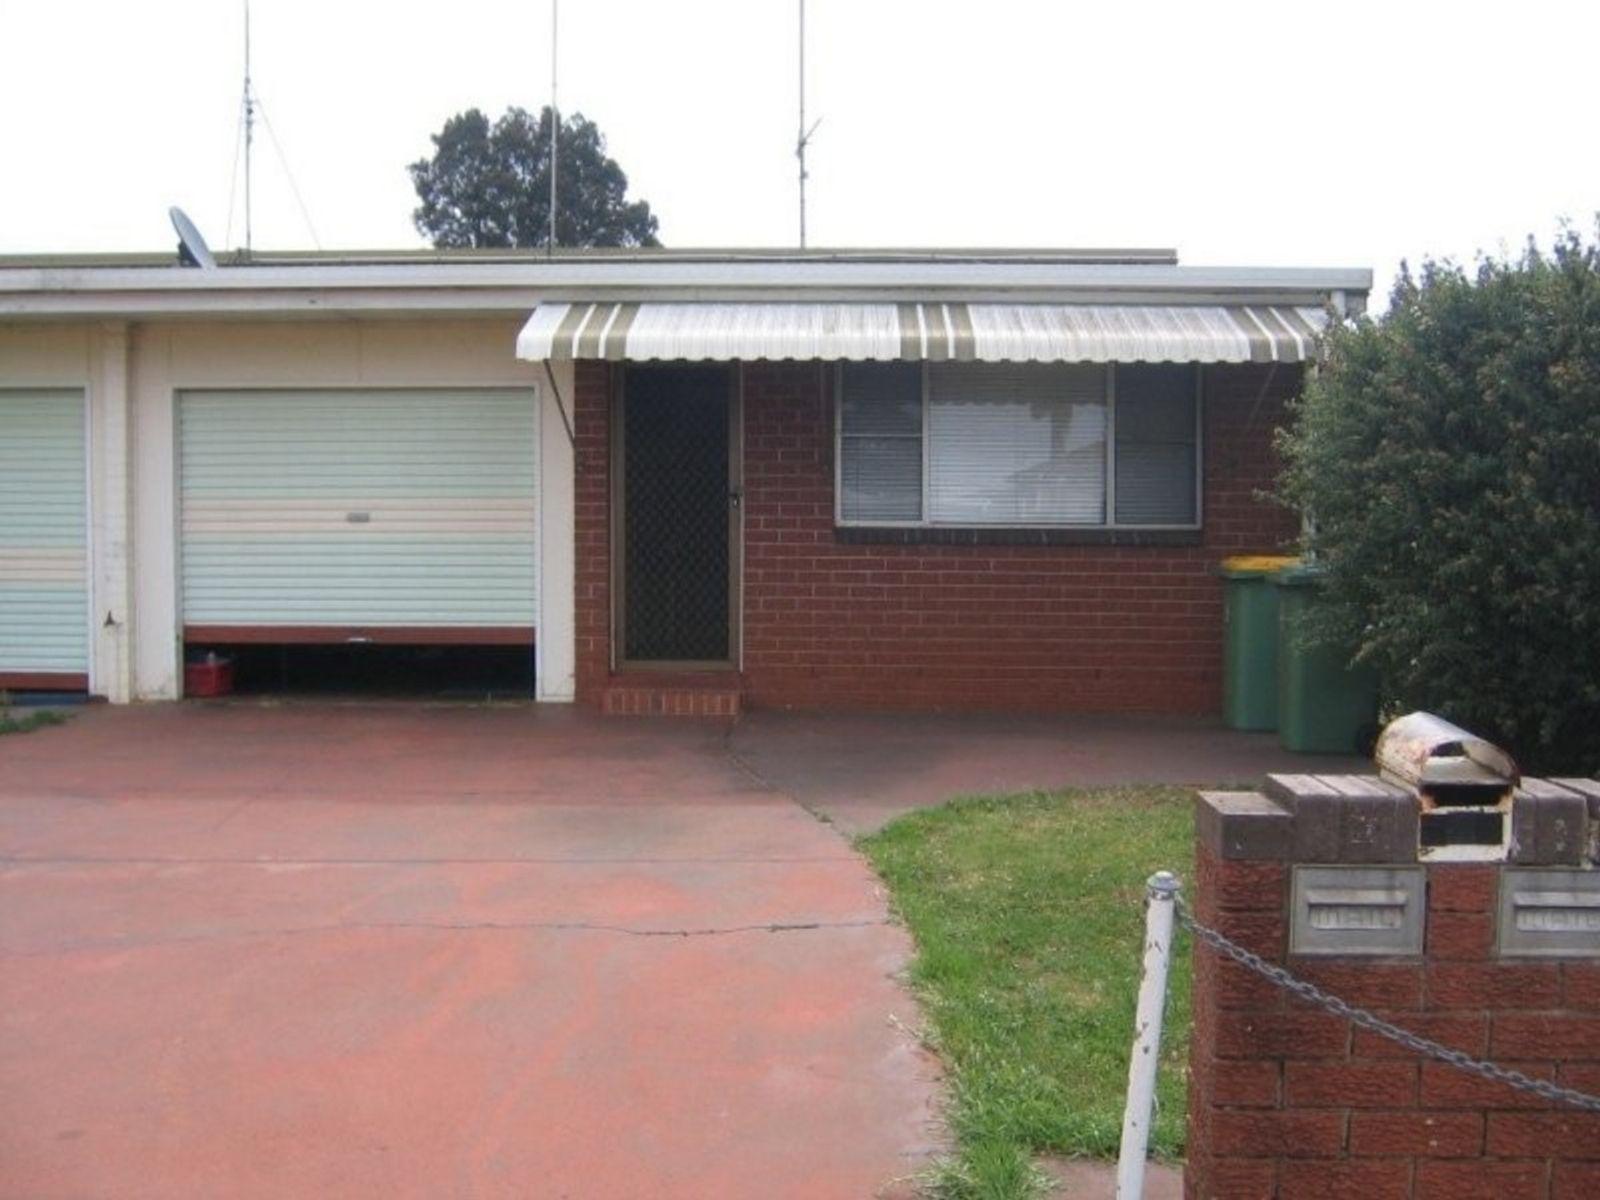 2/503 Greenwattle Street, Glenvale, QLD 4350